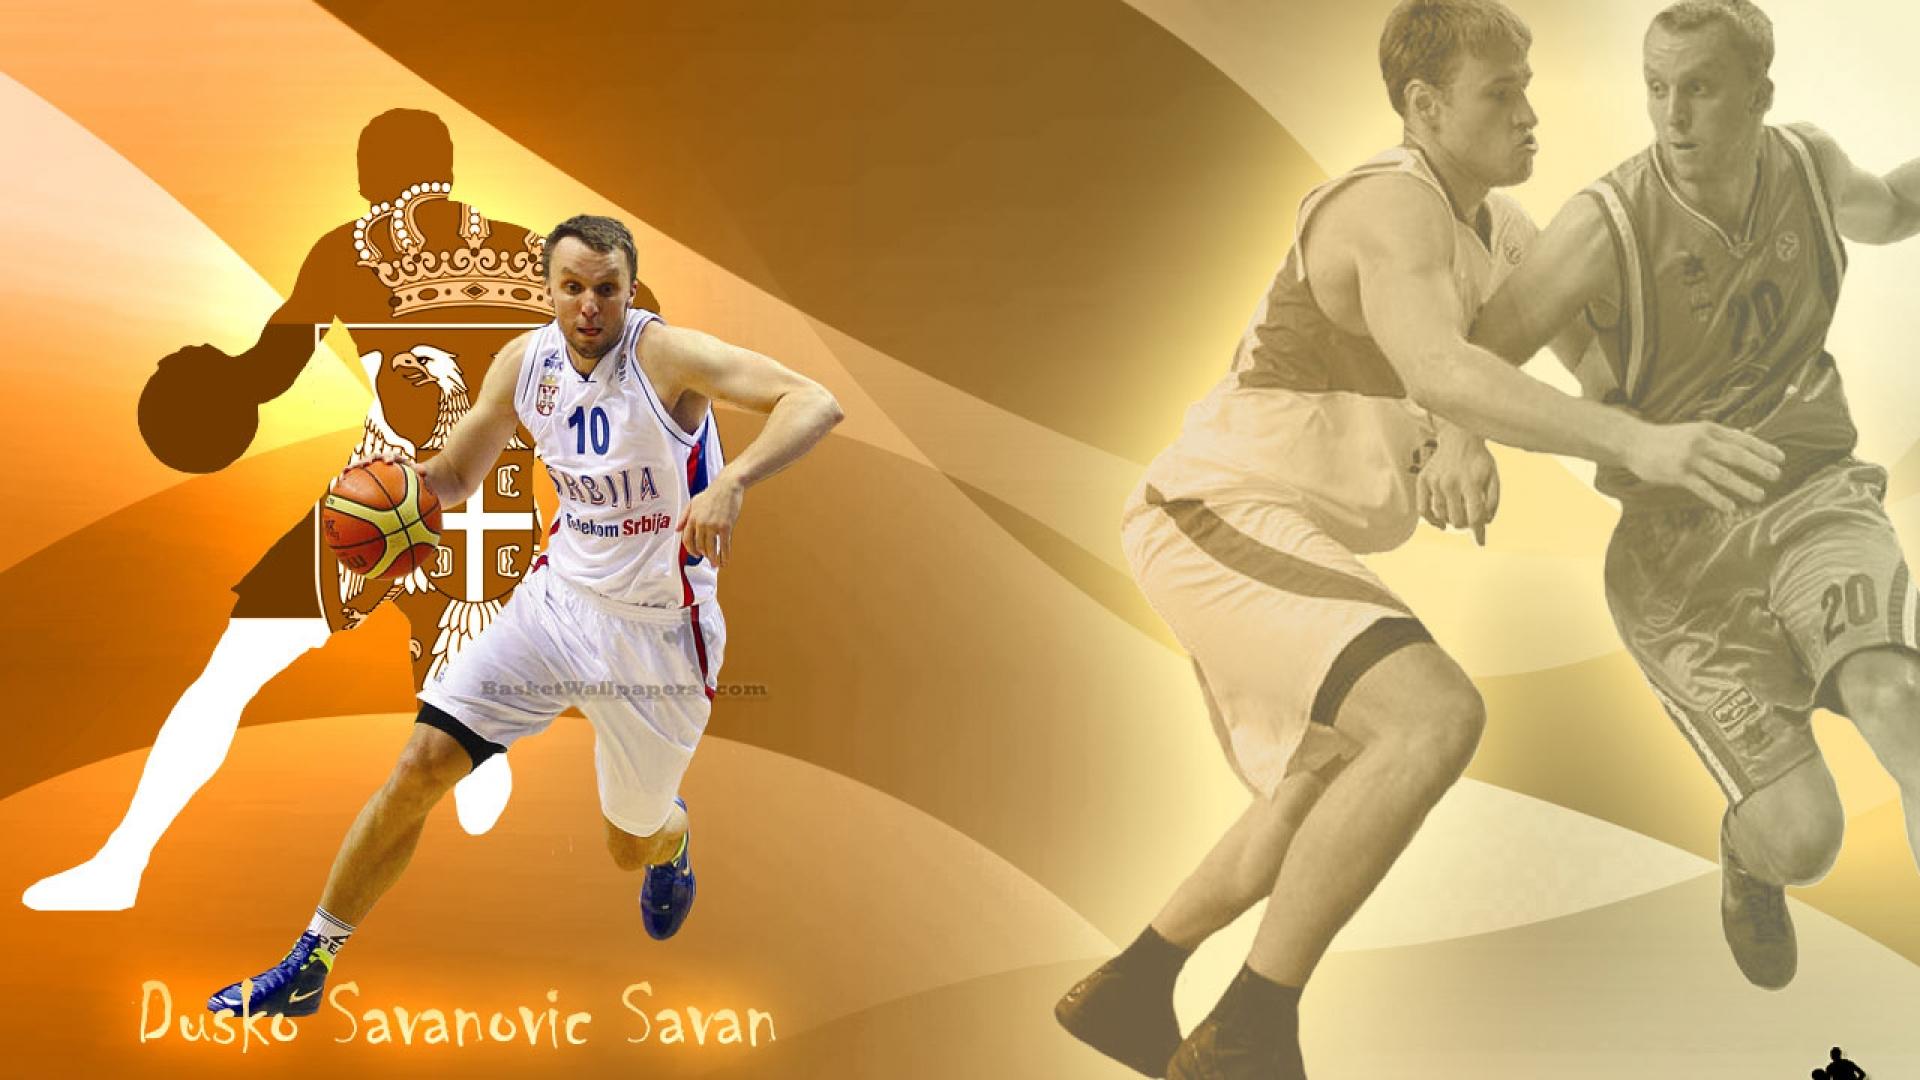 Dusko Savanovic Savan Wallpaper